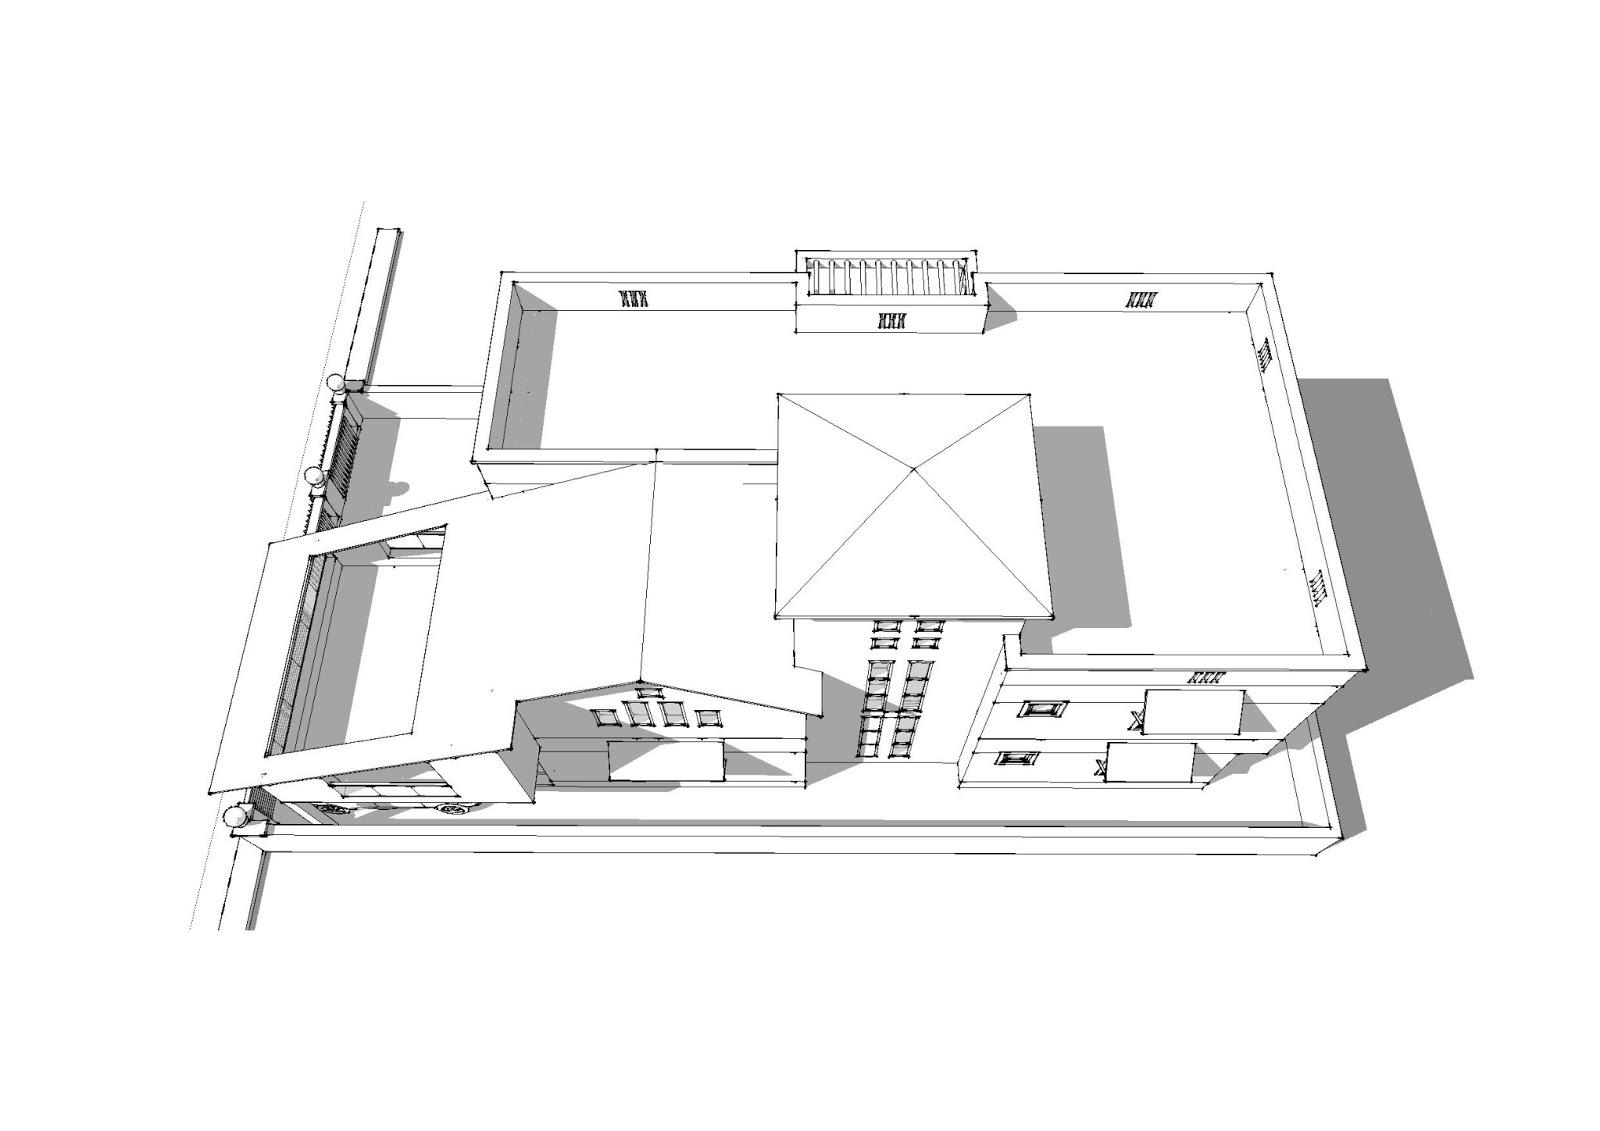 ... front elevation models renaissance vinod vijay house sketchup models